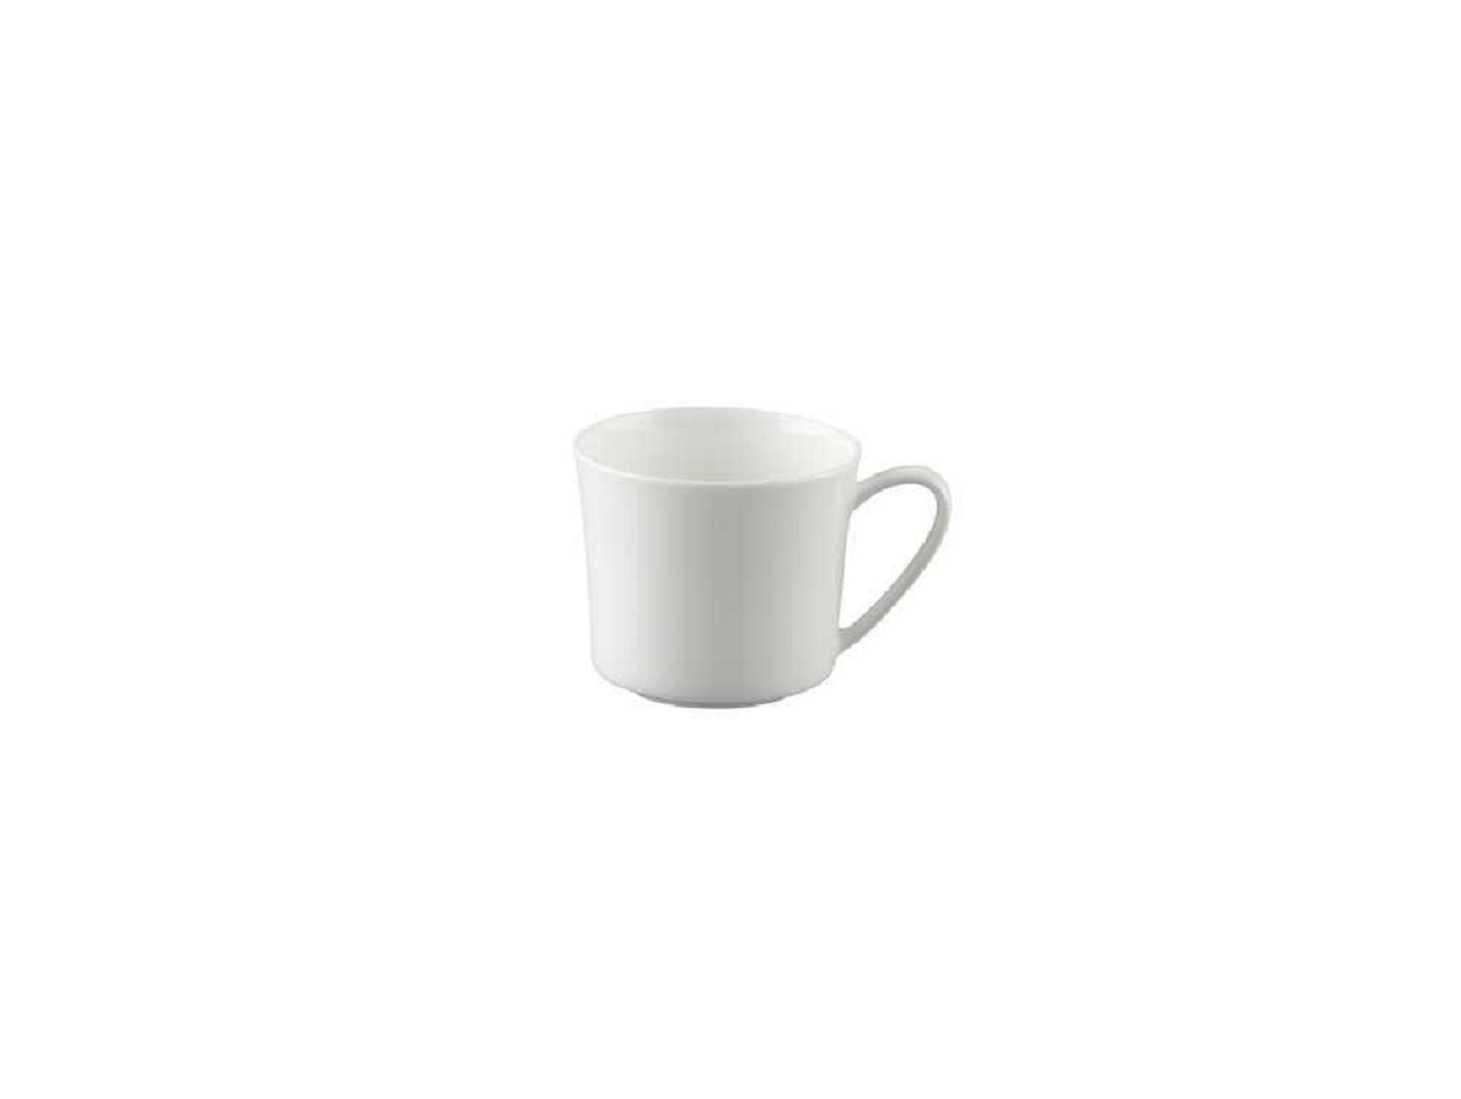 Онлайн каталог PROMENU: Чашка фарфоровая Rosenthal JADE, белый Rosenthal 61040-800001-14742